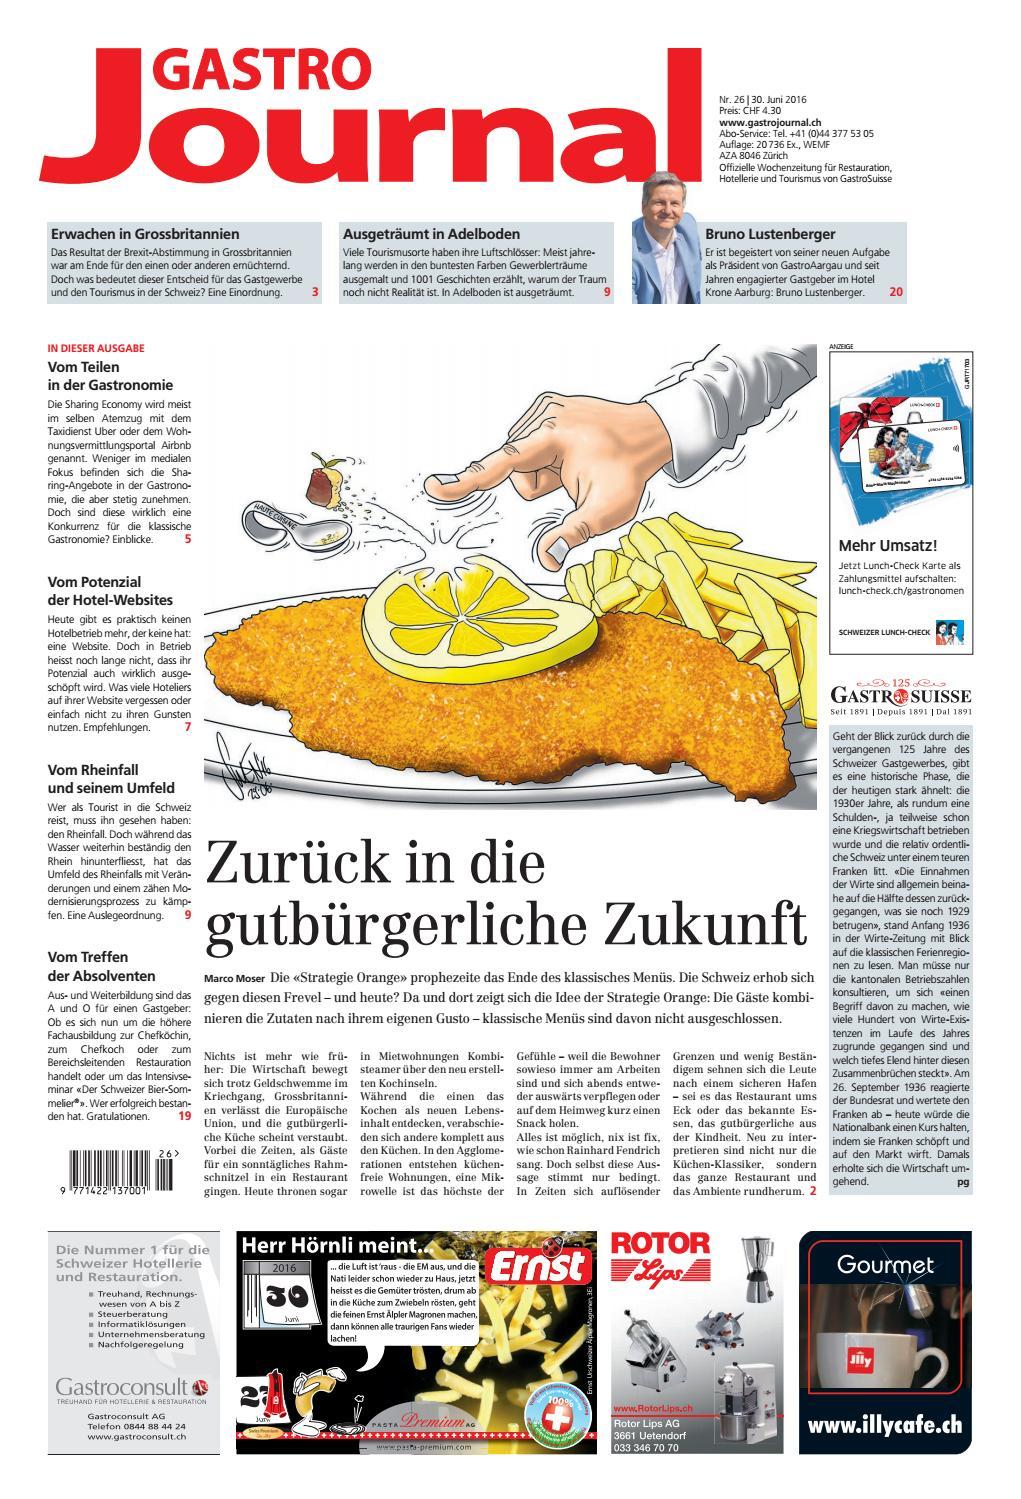 GastroJournal 26/2016 by Gastrojournal - issuu